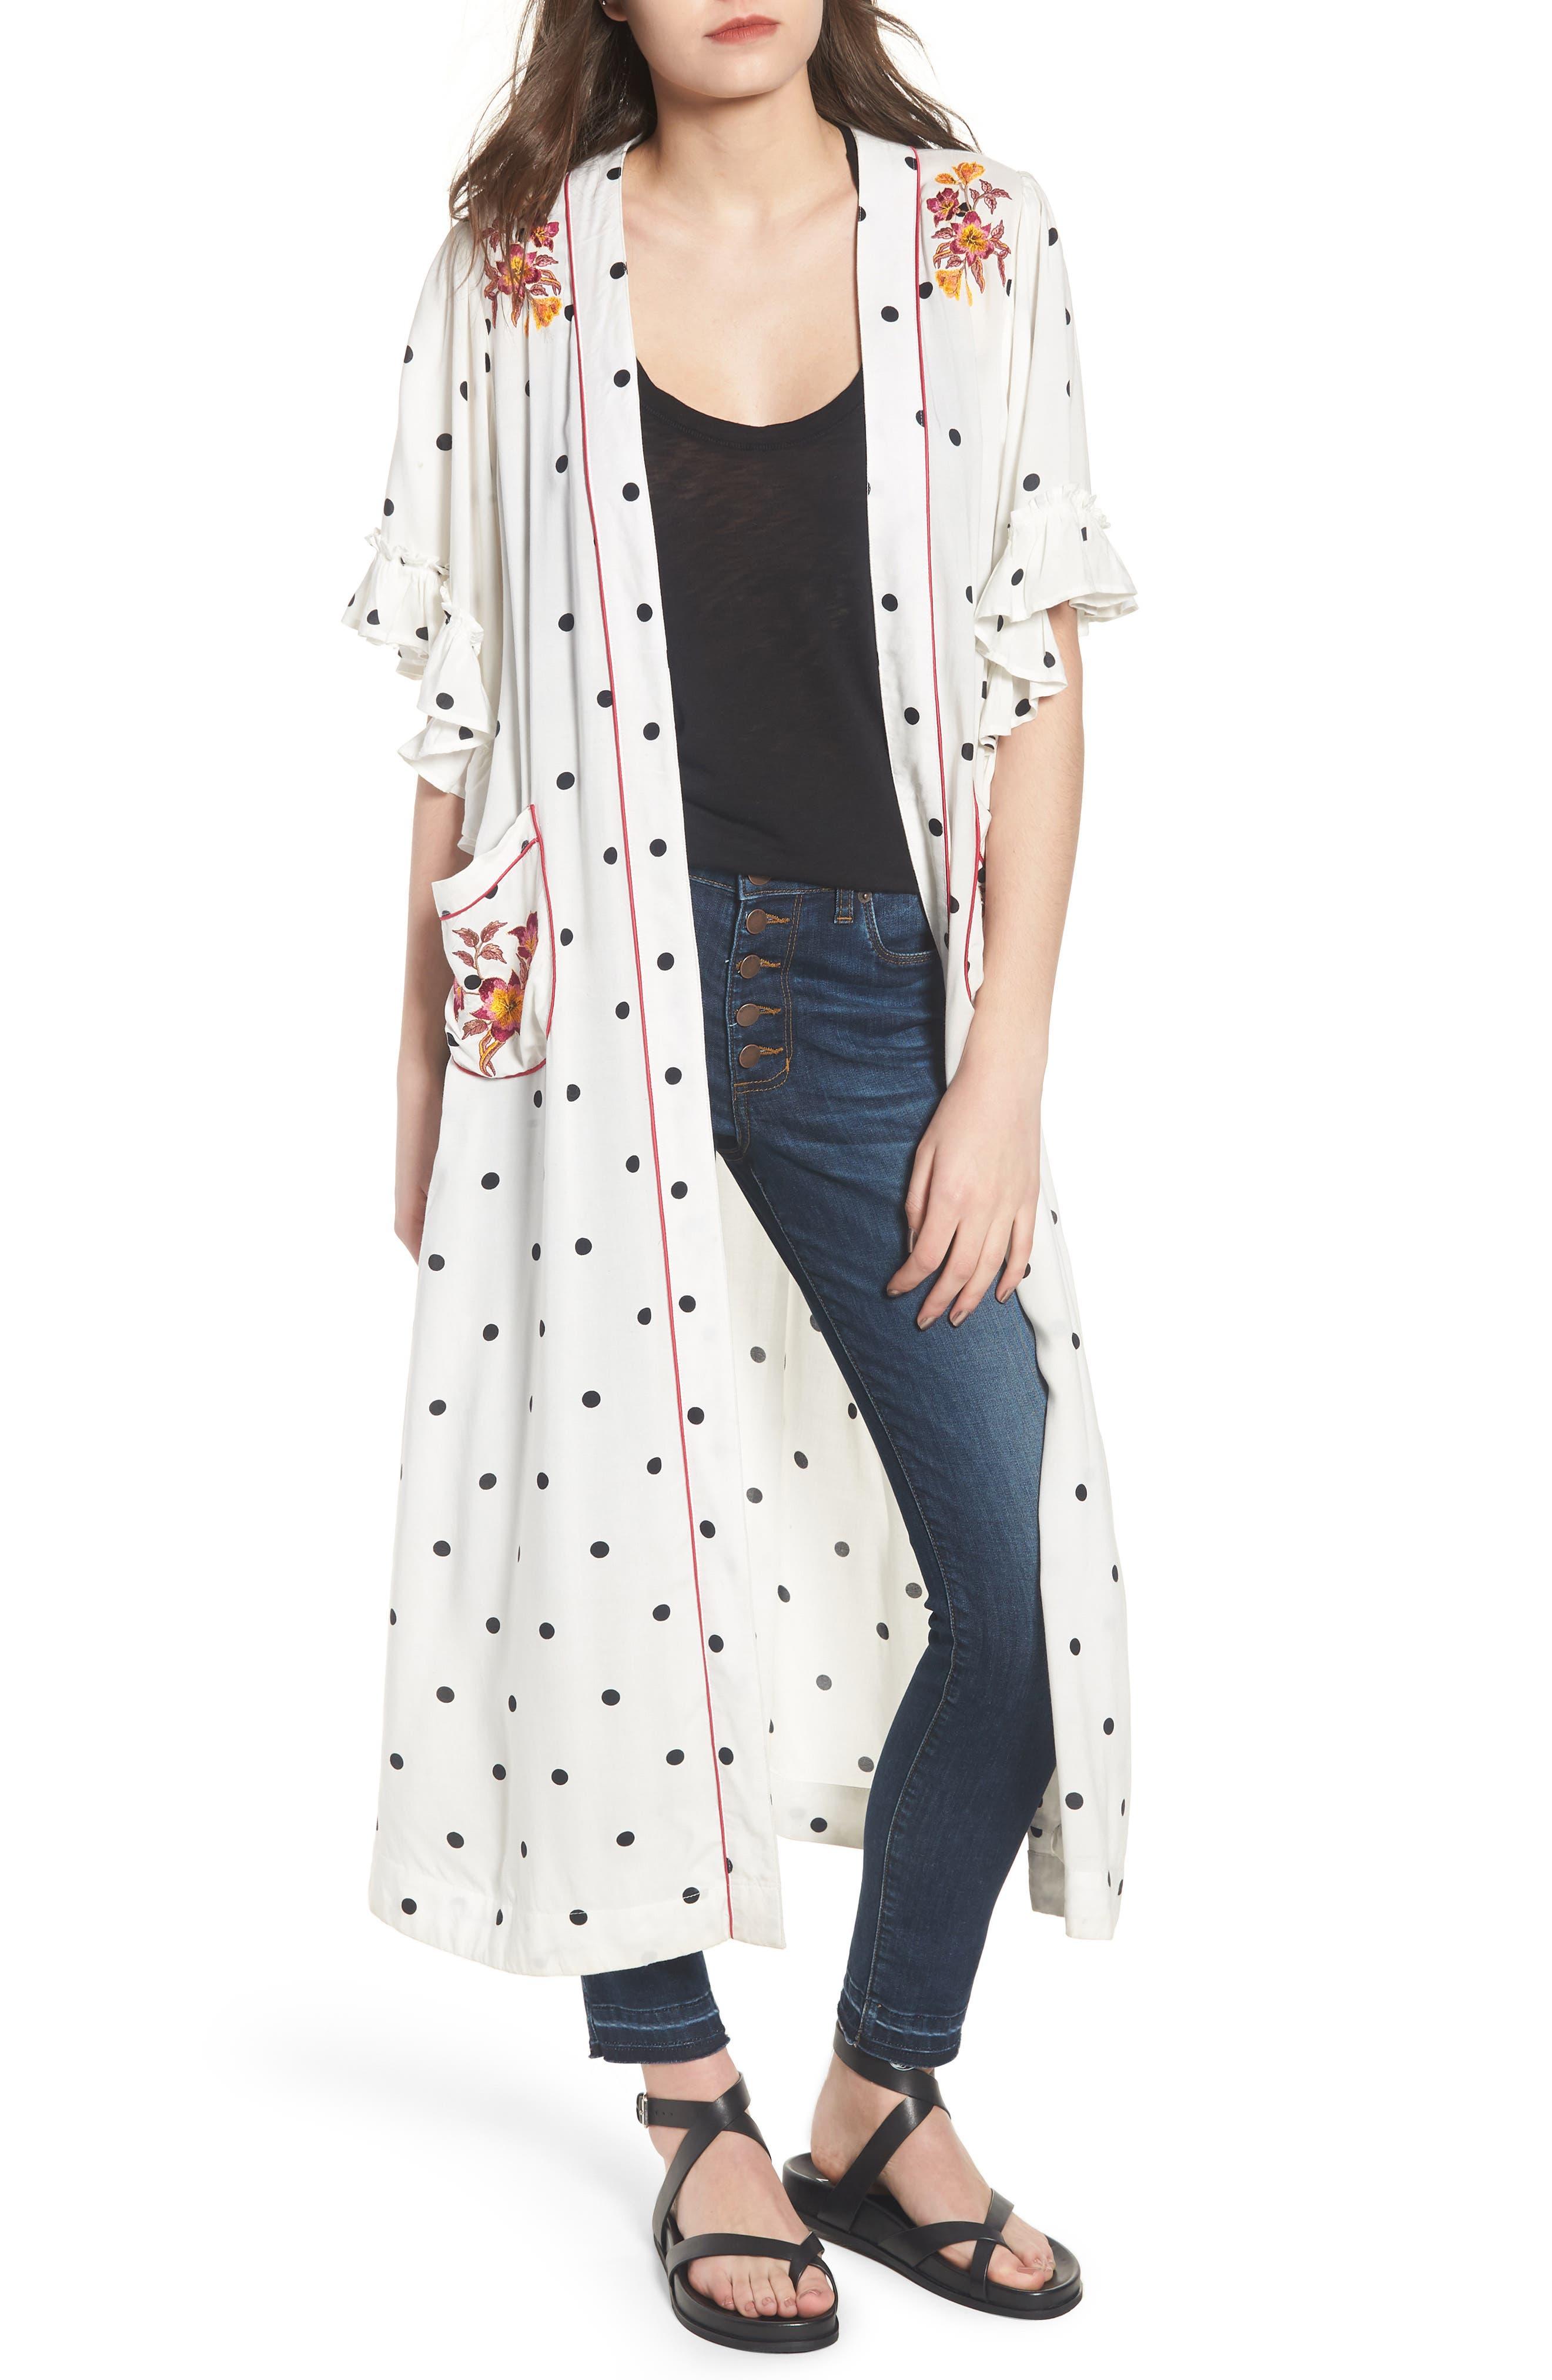 Hot Spot Kimono,                             Main thumbnail 1, color,                             Black/ White Polka Dot Print